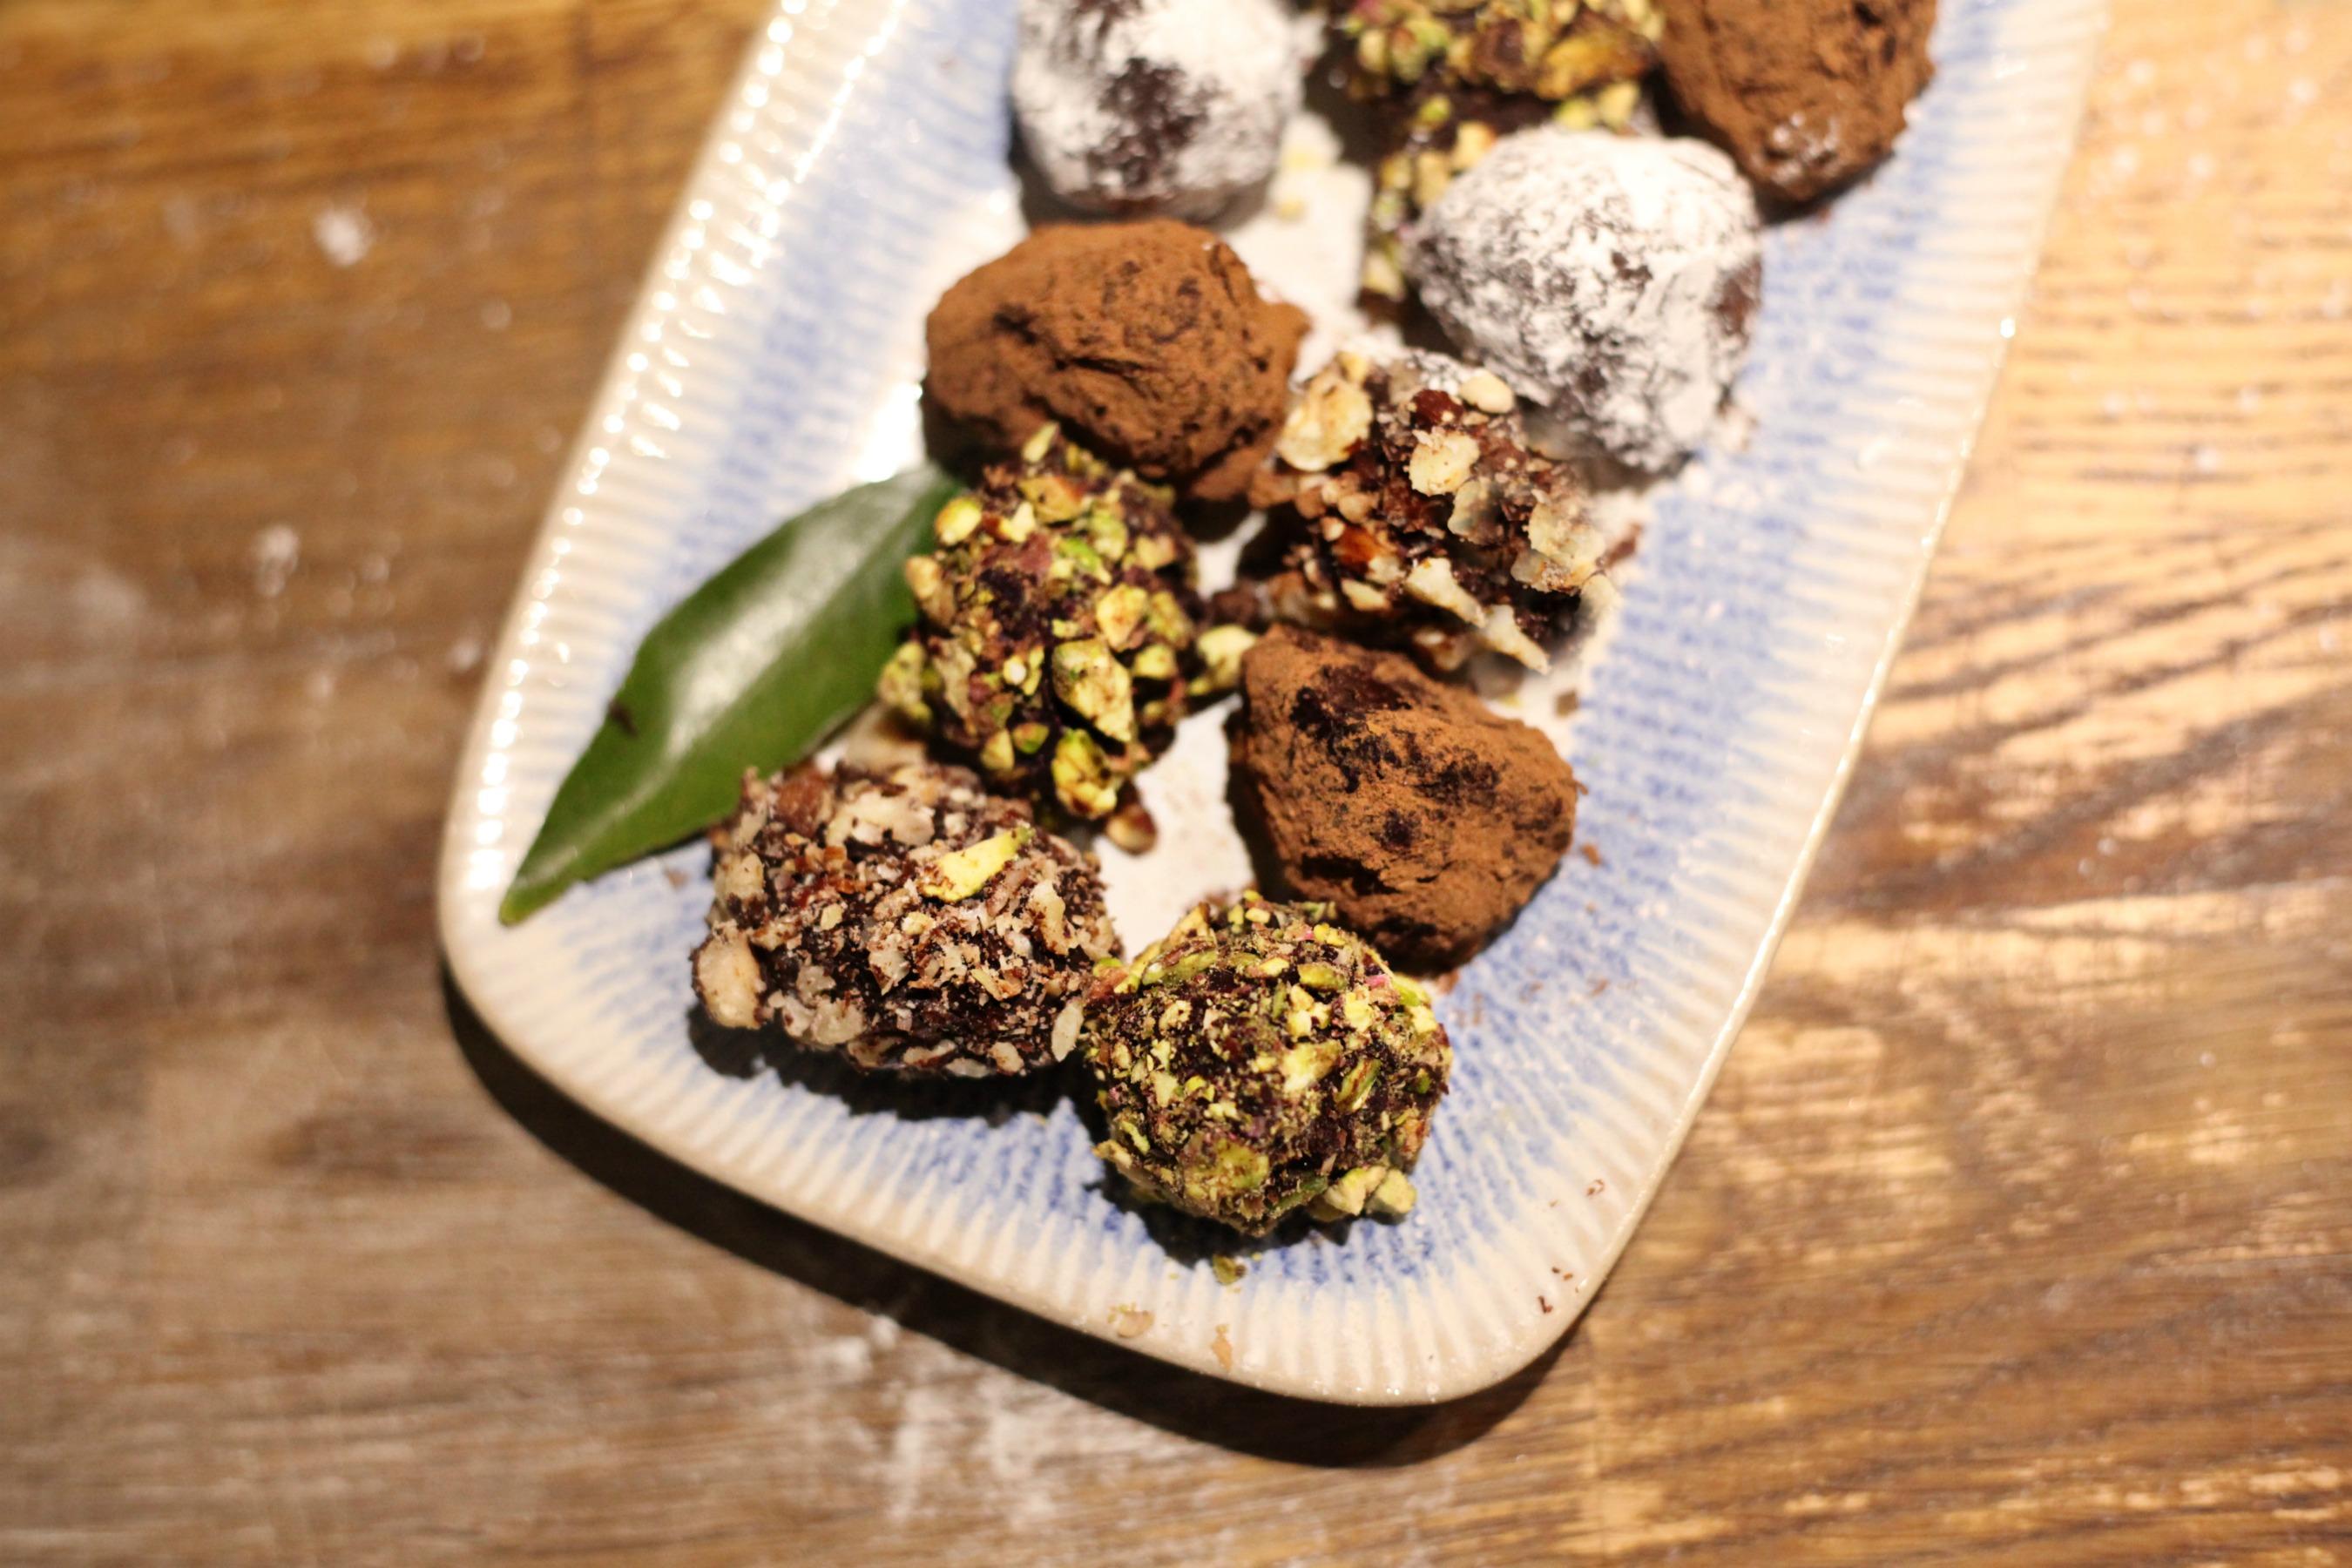 Learn how to make festive chocolate truffles